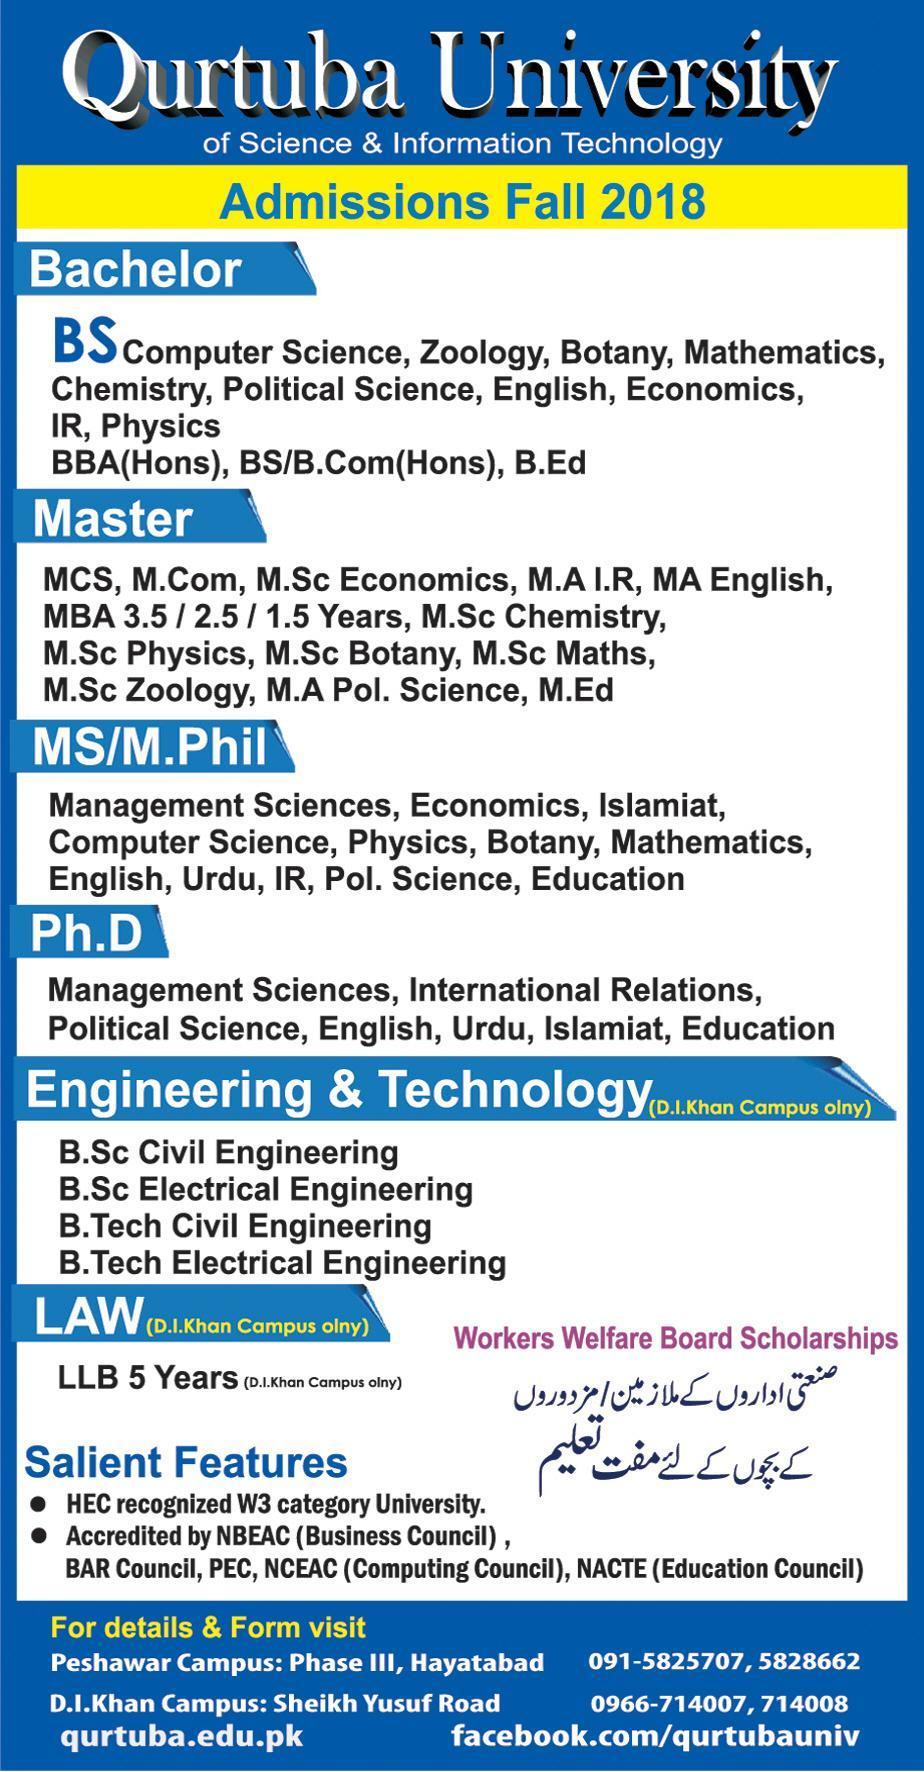 Qurtuba University Admission 2018 Form Advertisement Last Date